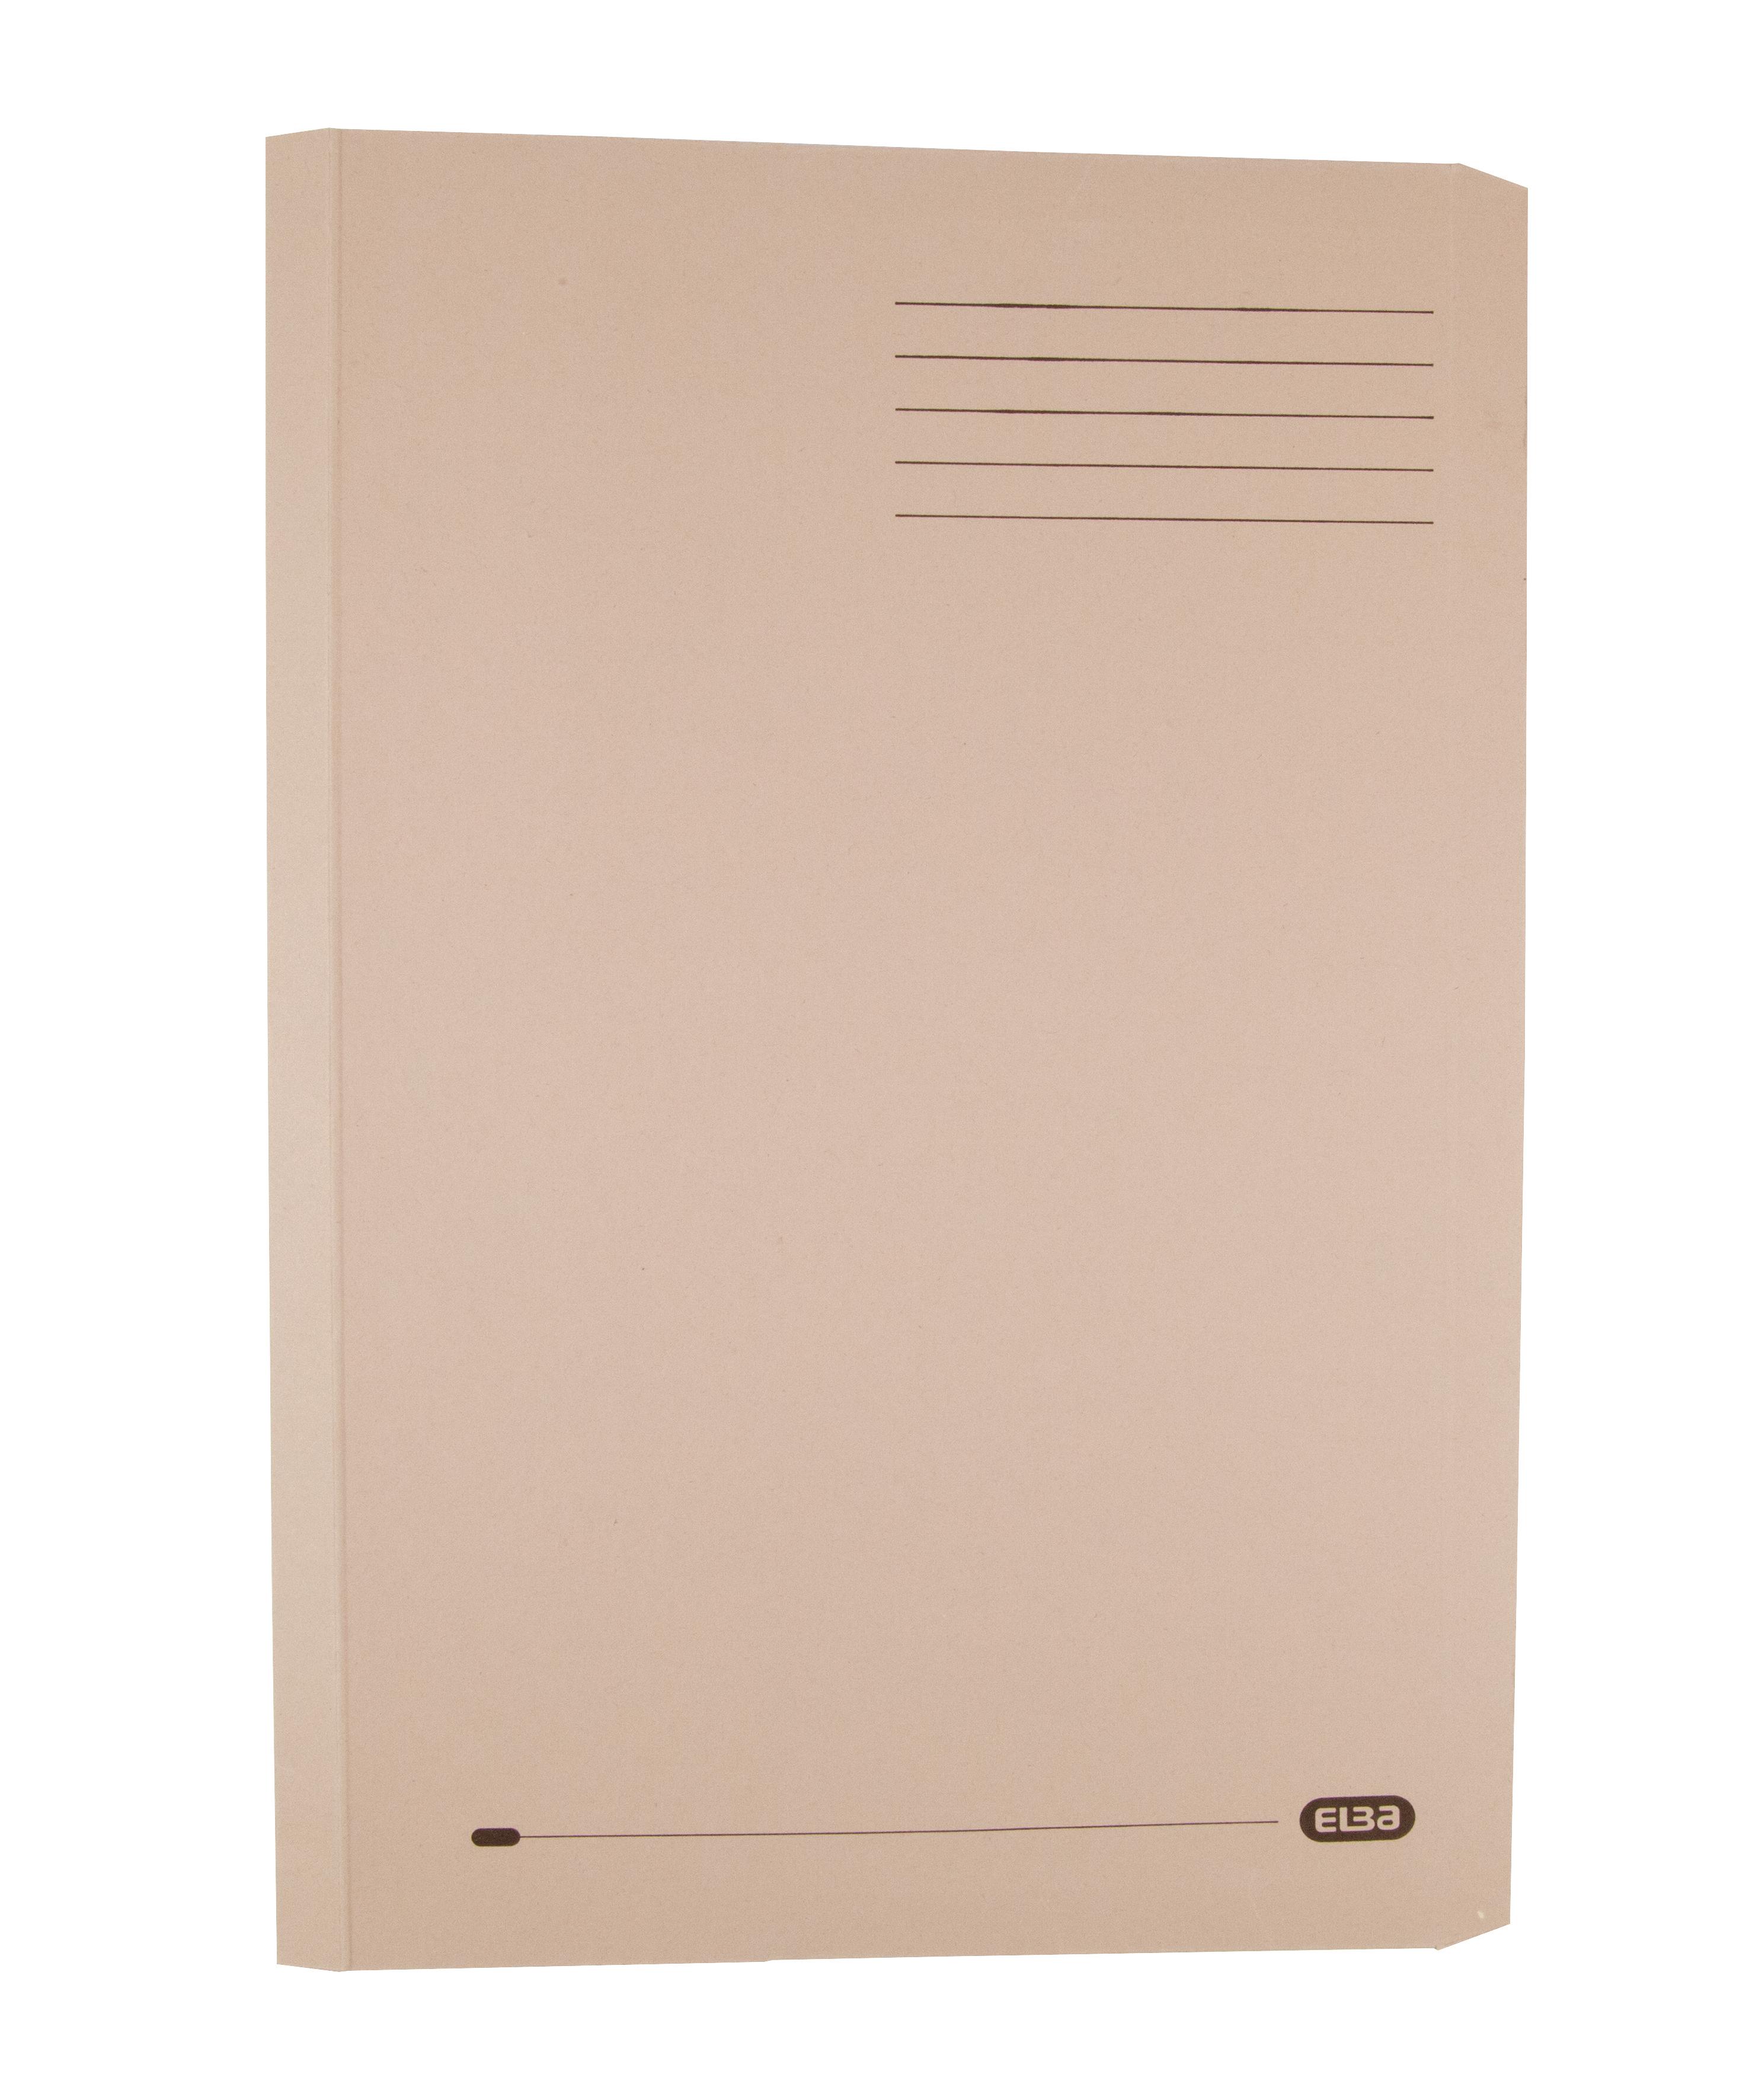 Elba Clifton Flat Bar Pocket (Rear) File 285gsm Capacity 50mm Foolscap Buff Ref 100090177 [Pack 25]